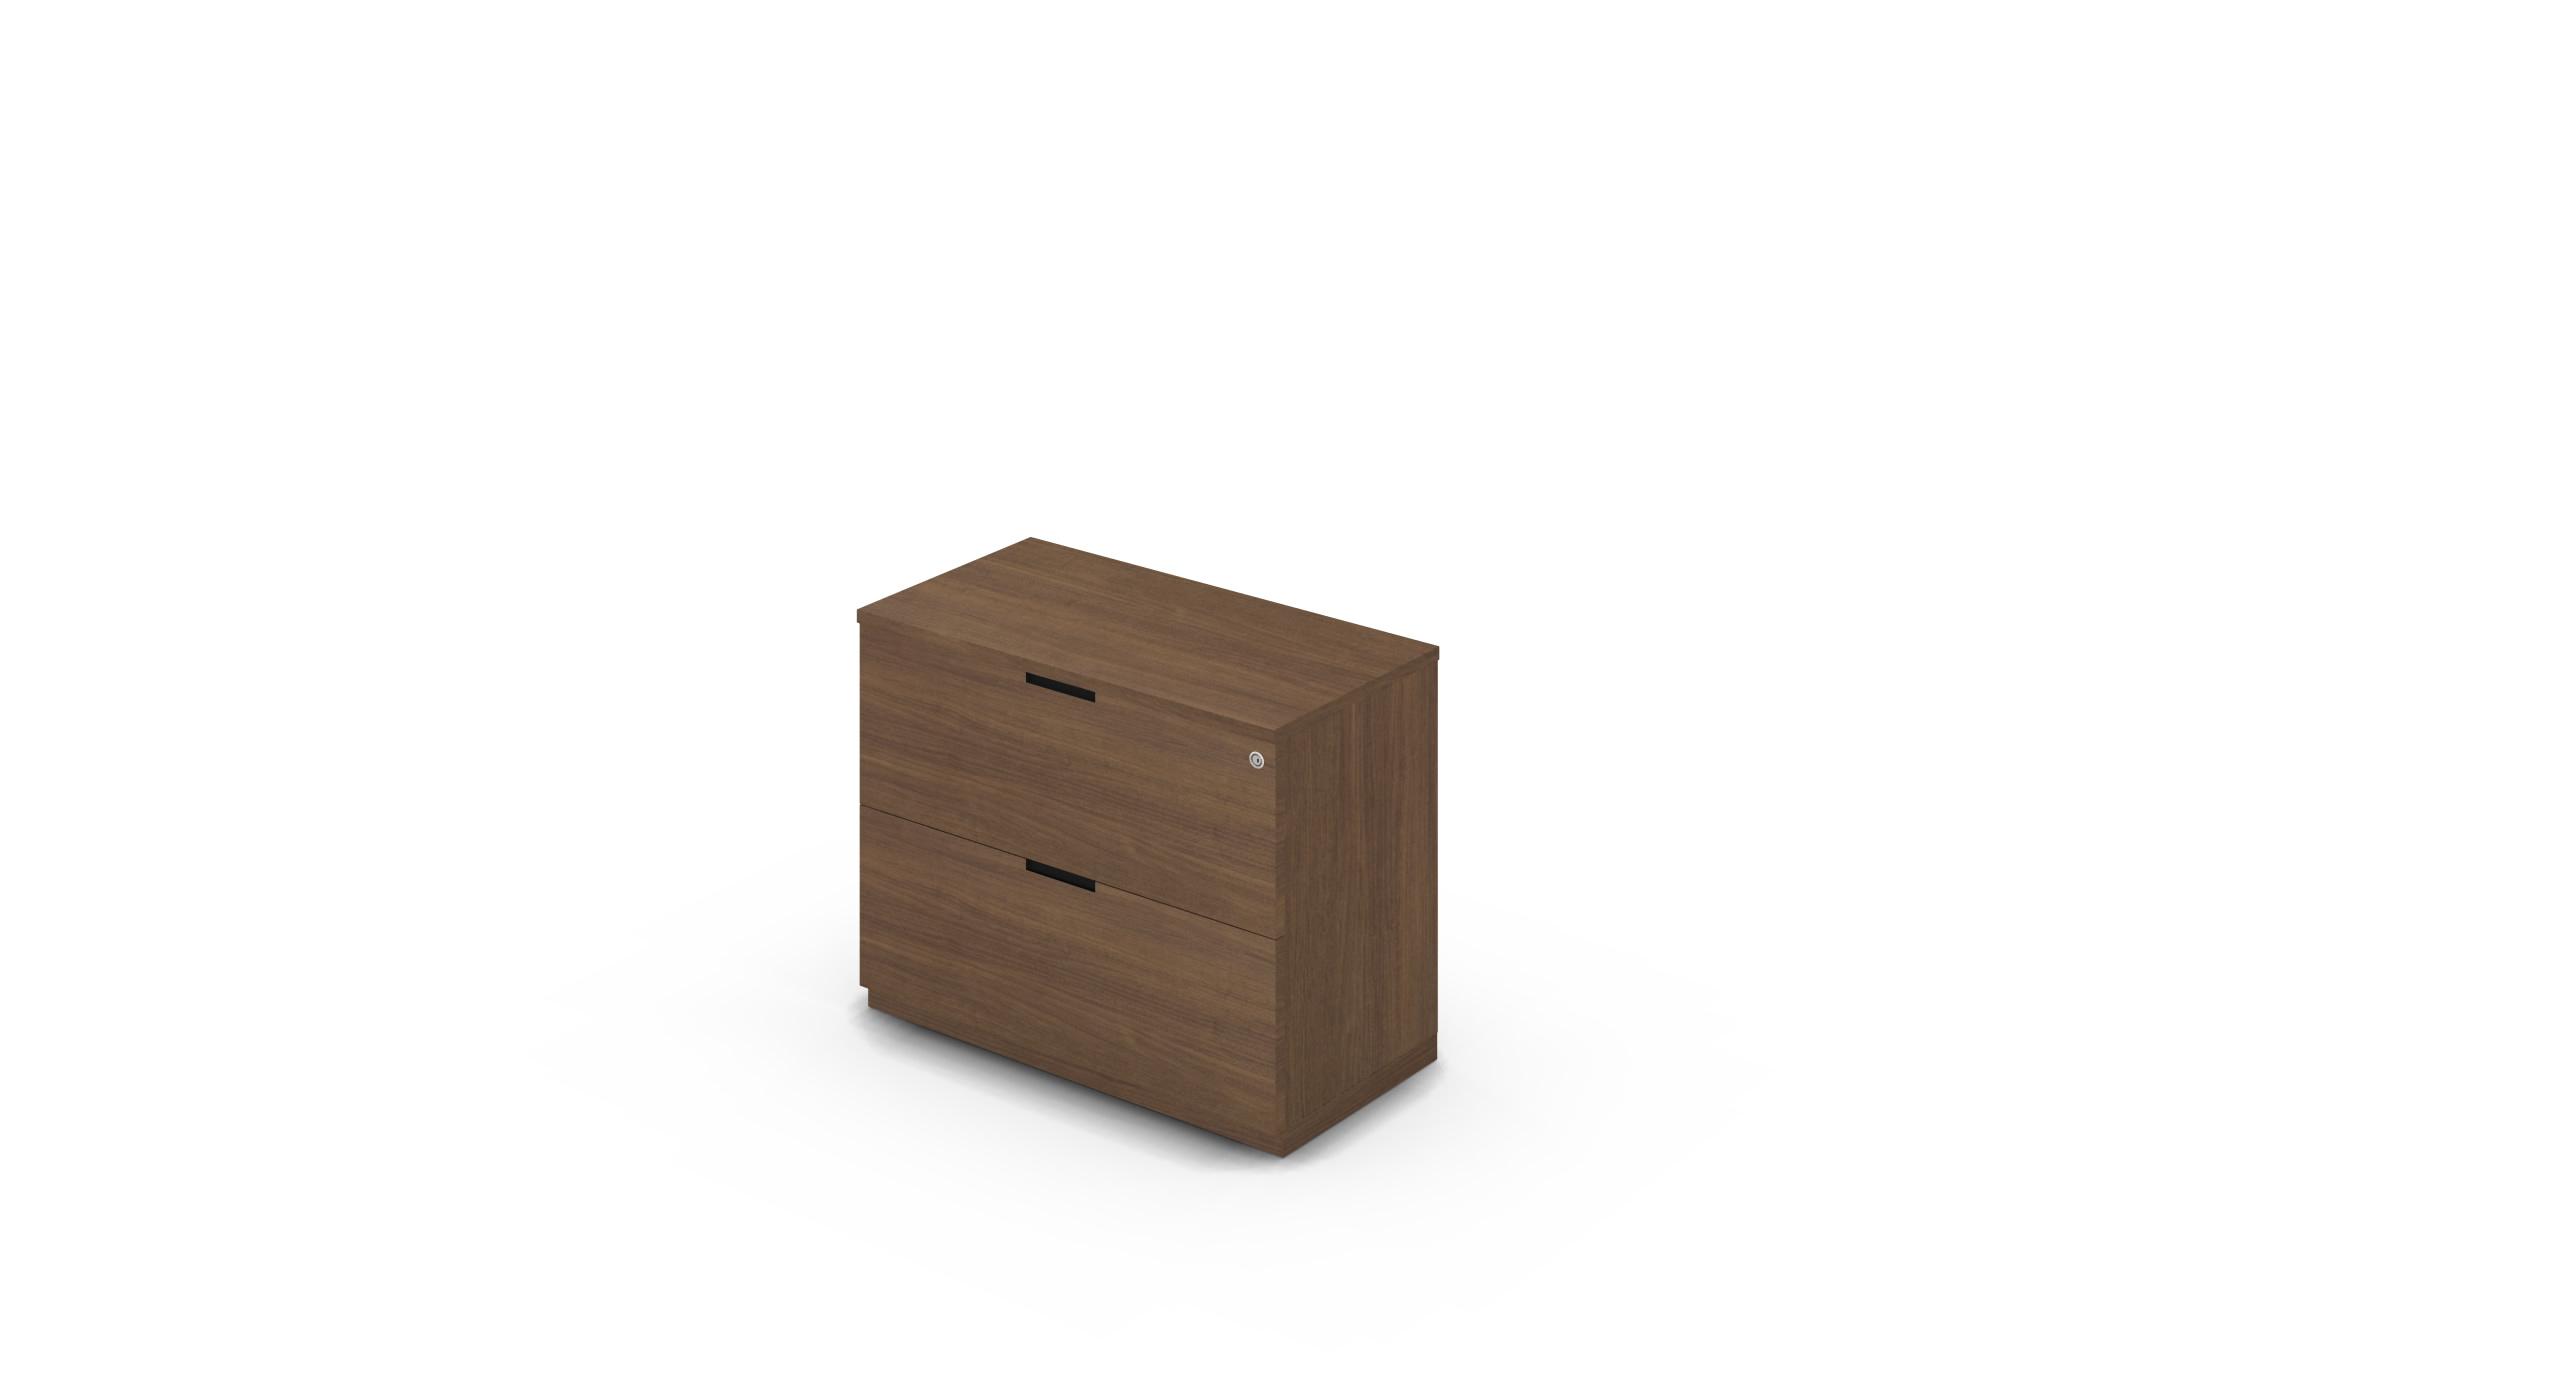 Cabinet_900x450x775_DR_Walnut_CutOut_WithCylinder